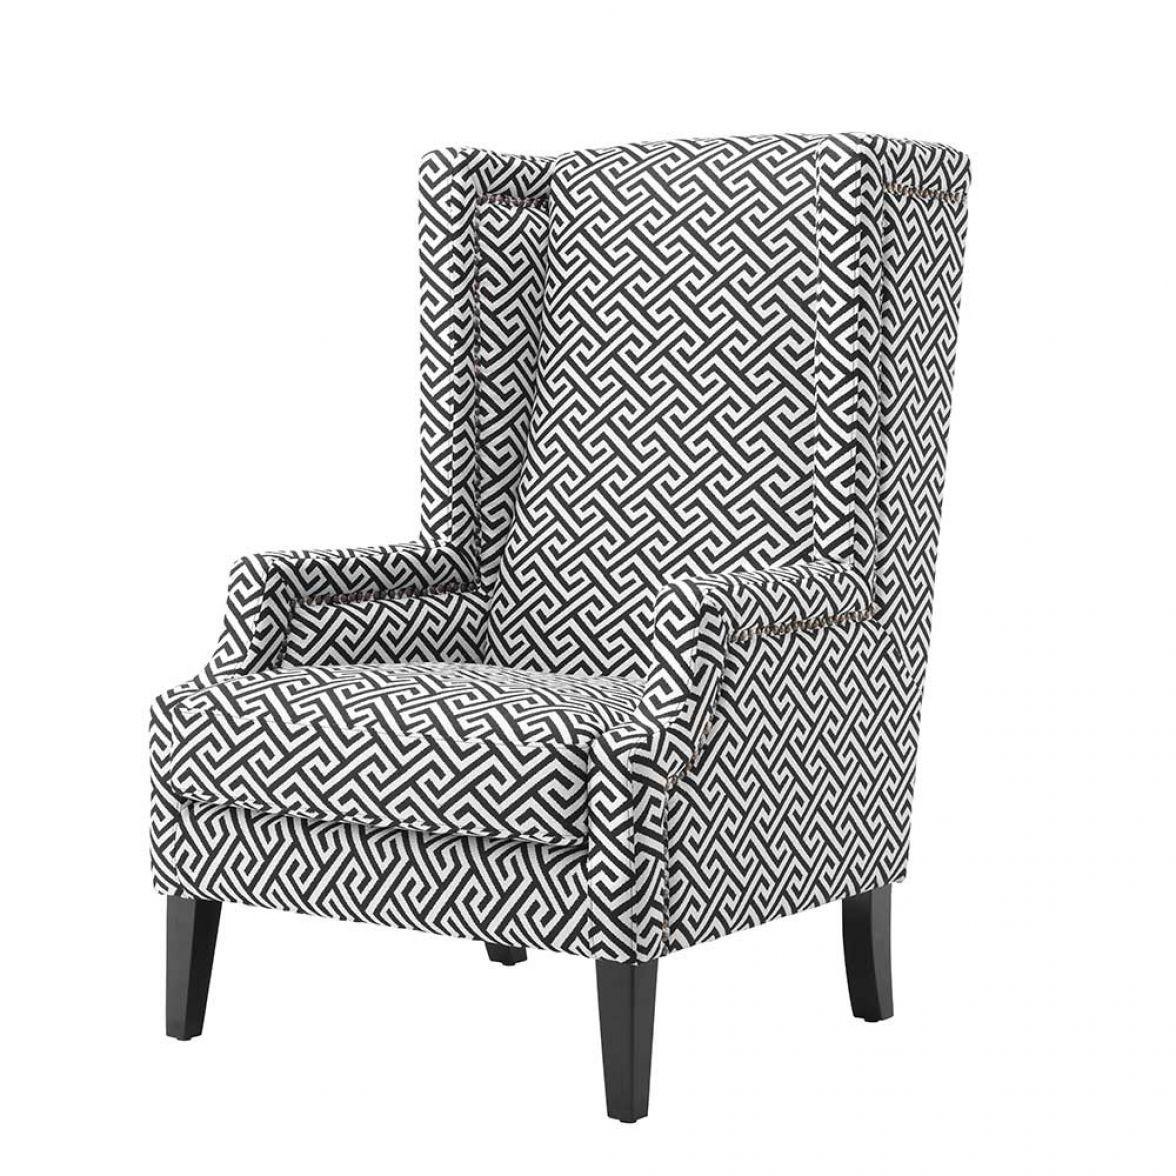 Eleventy armchair фото цена